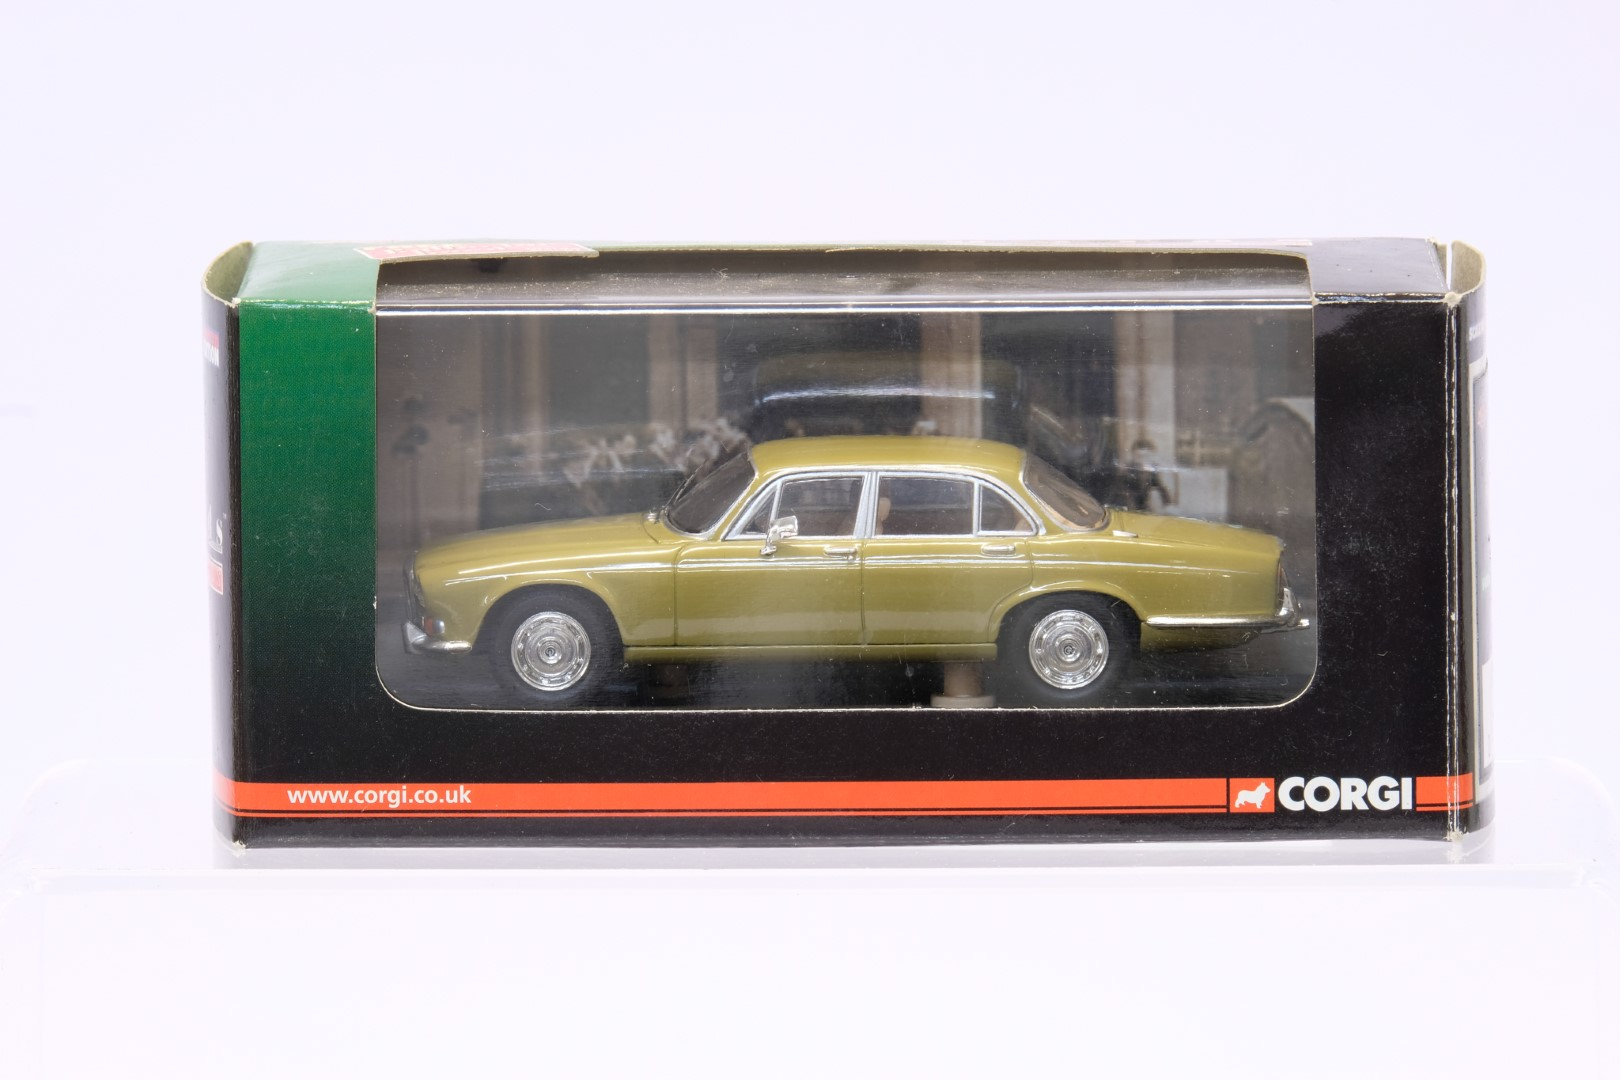 Vanguards 4 Boxed Car Models - Image 2 of 5